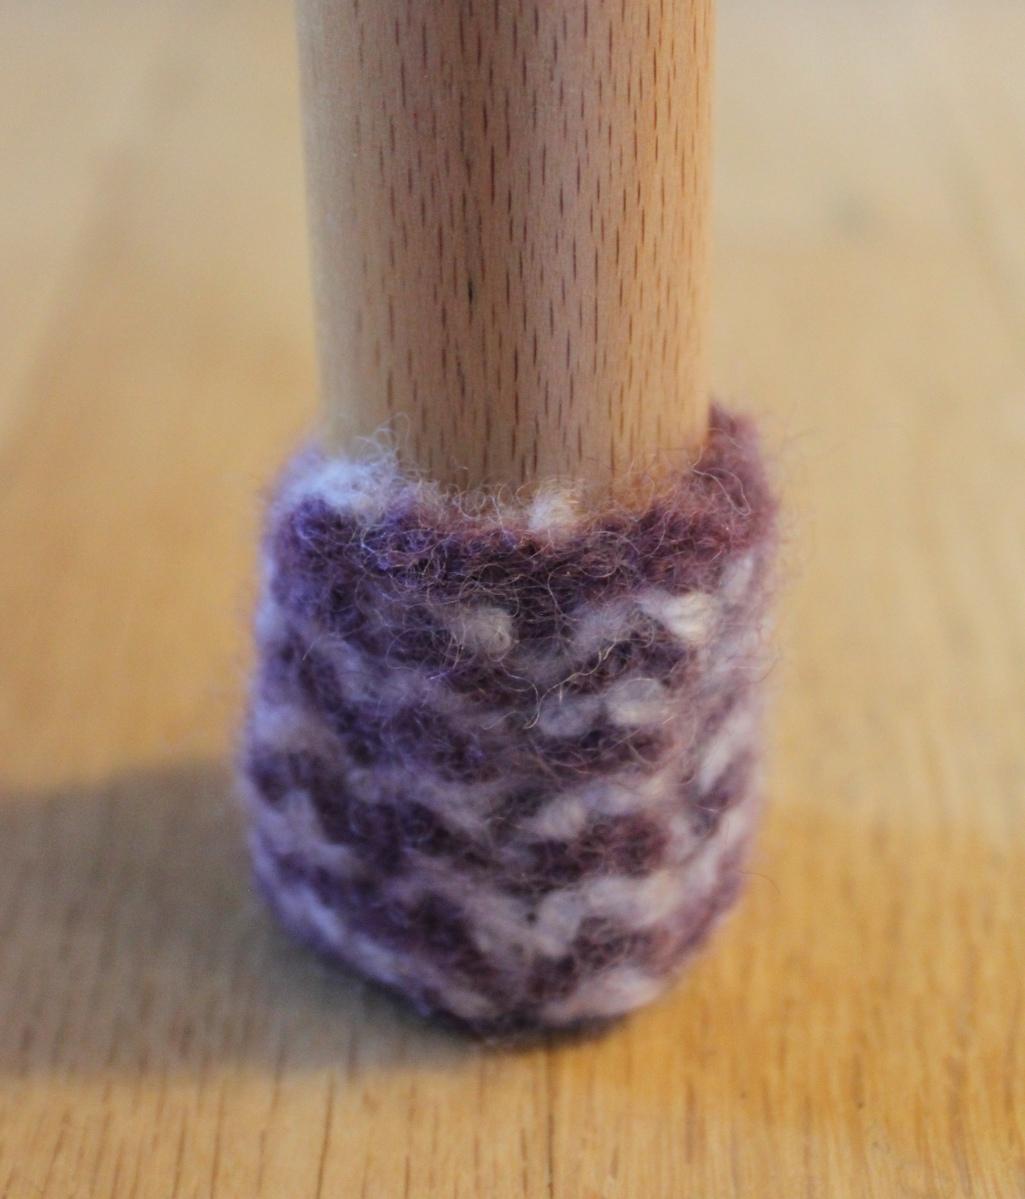 Knitting Nancy Toilet Paper Roll : Toilet paper roll knitting nancy idea felted chair